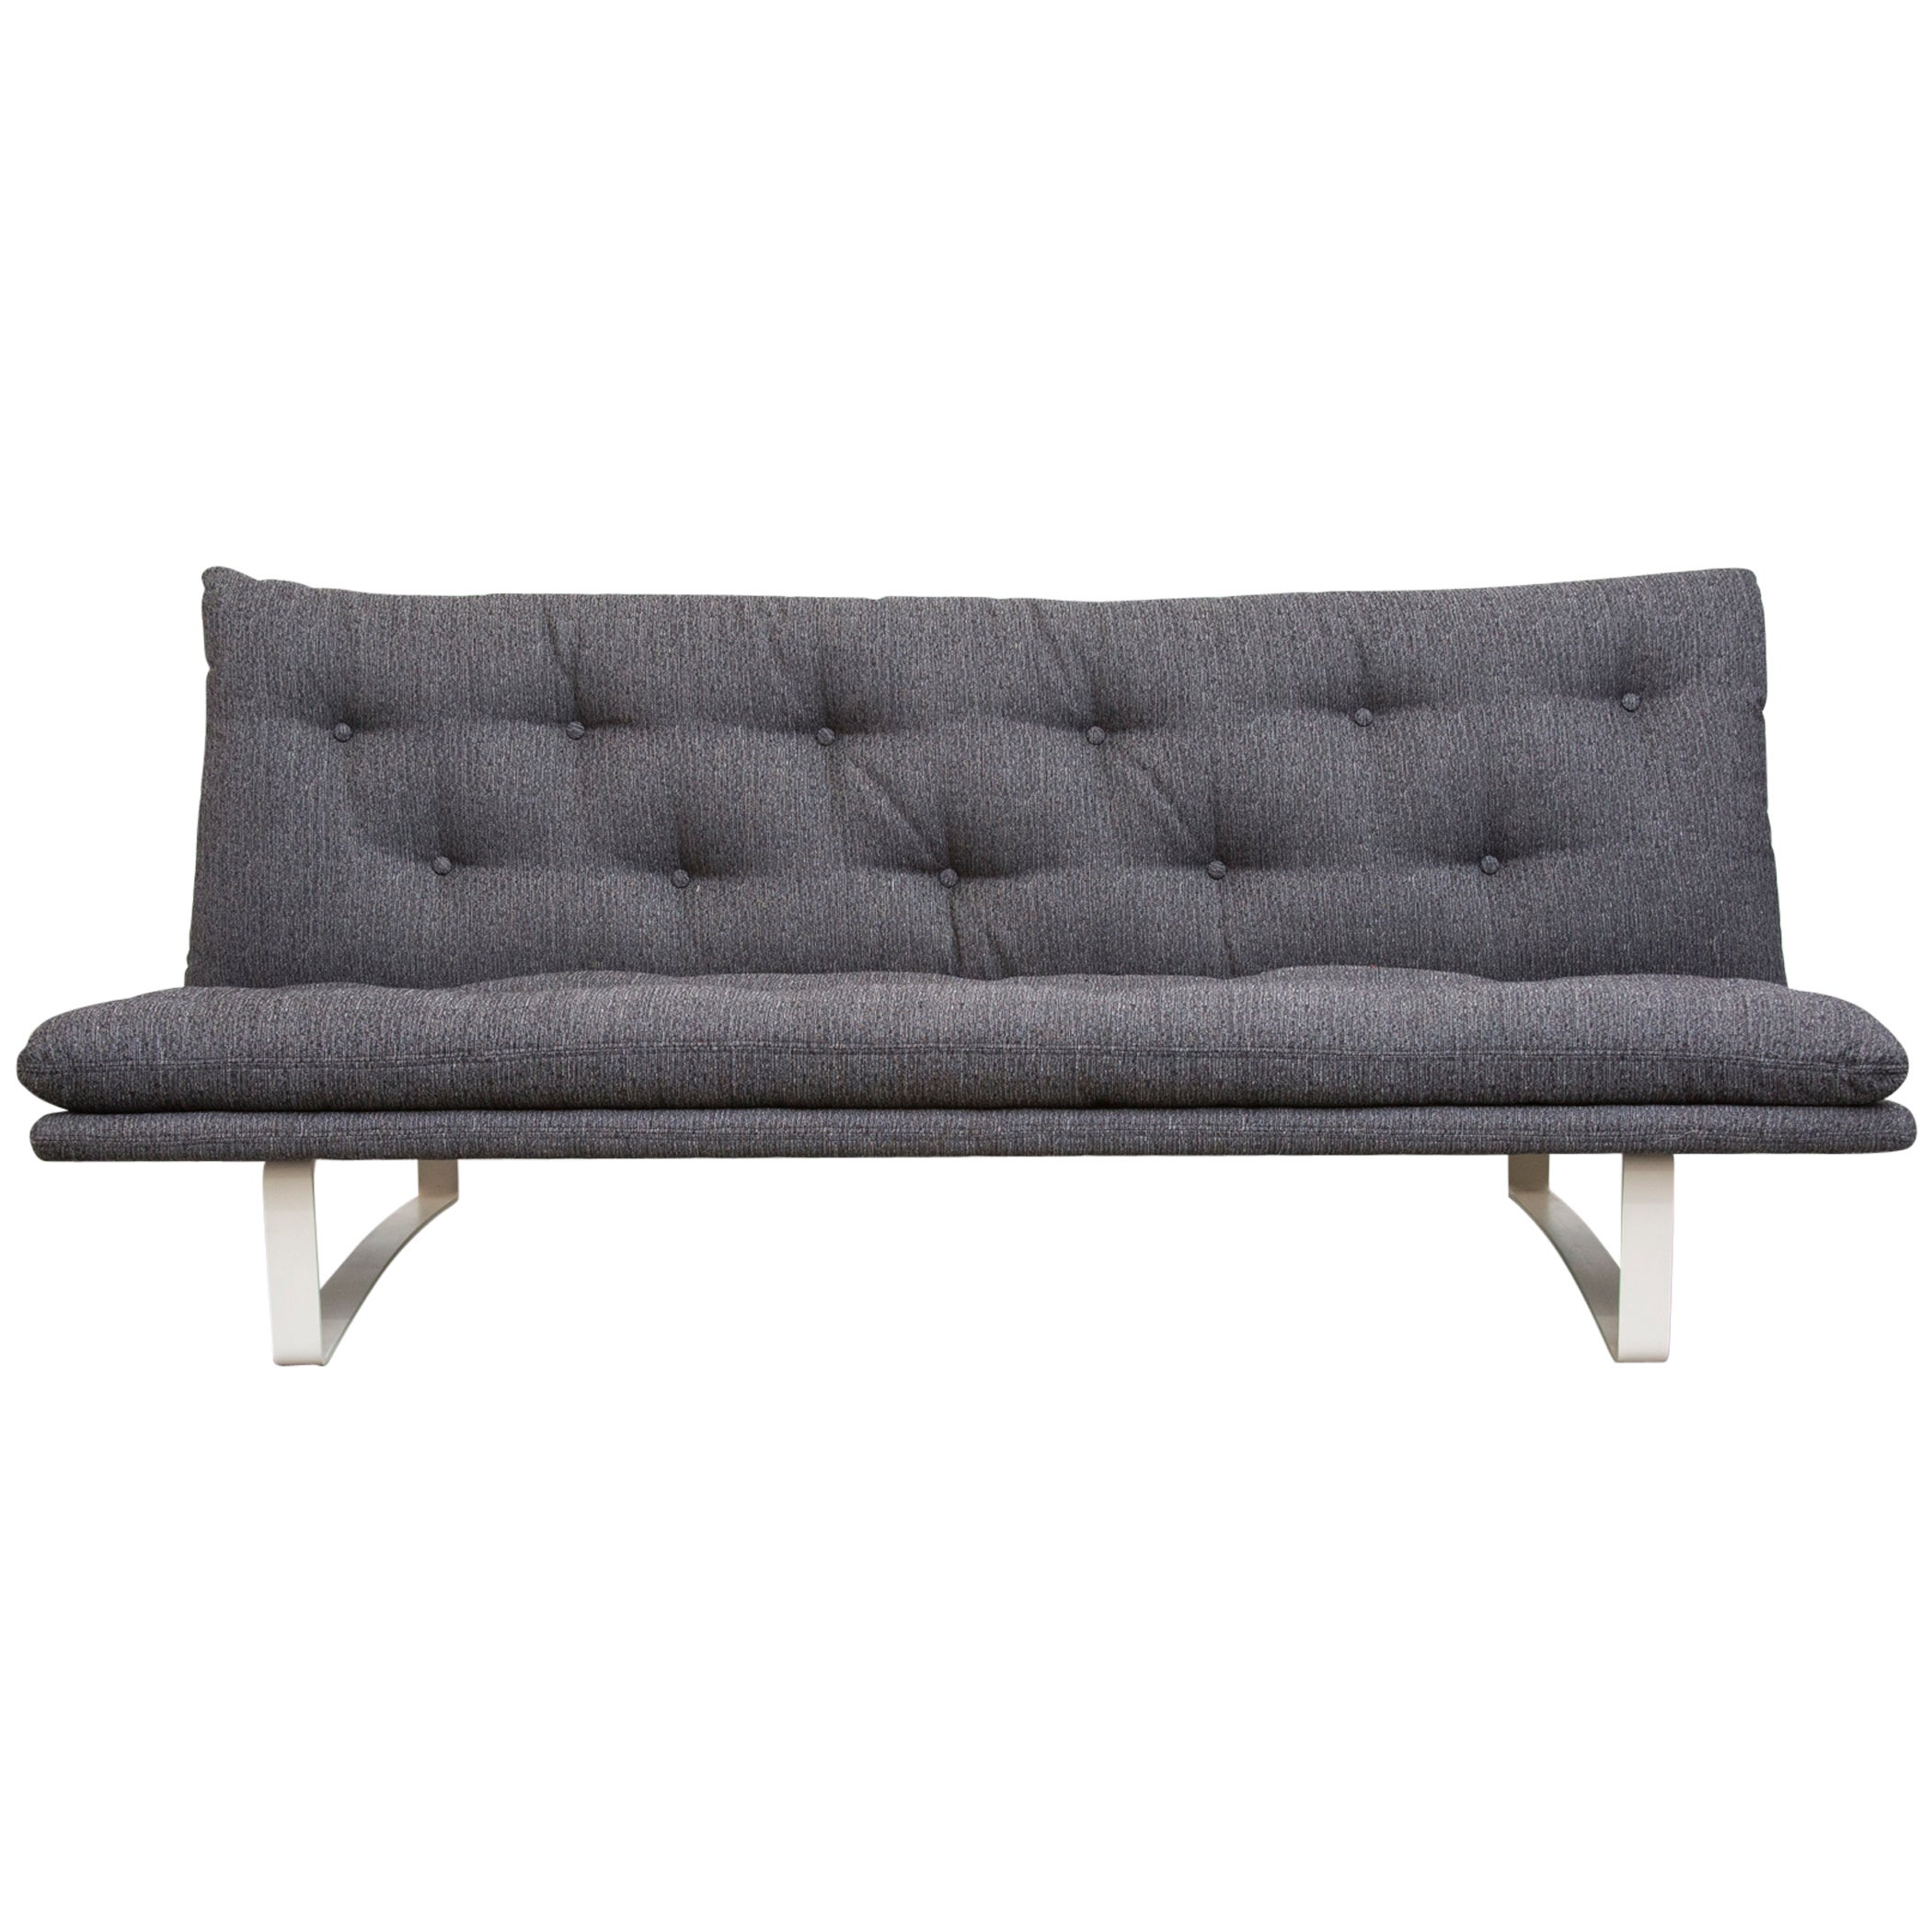 Kho Liang Ie C684 Sofa for Artifort